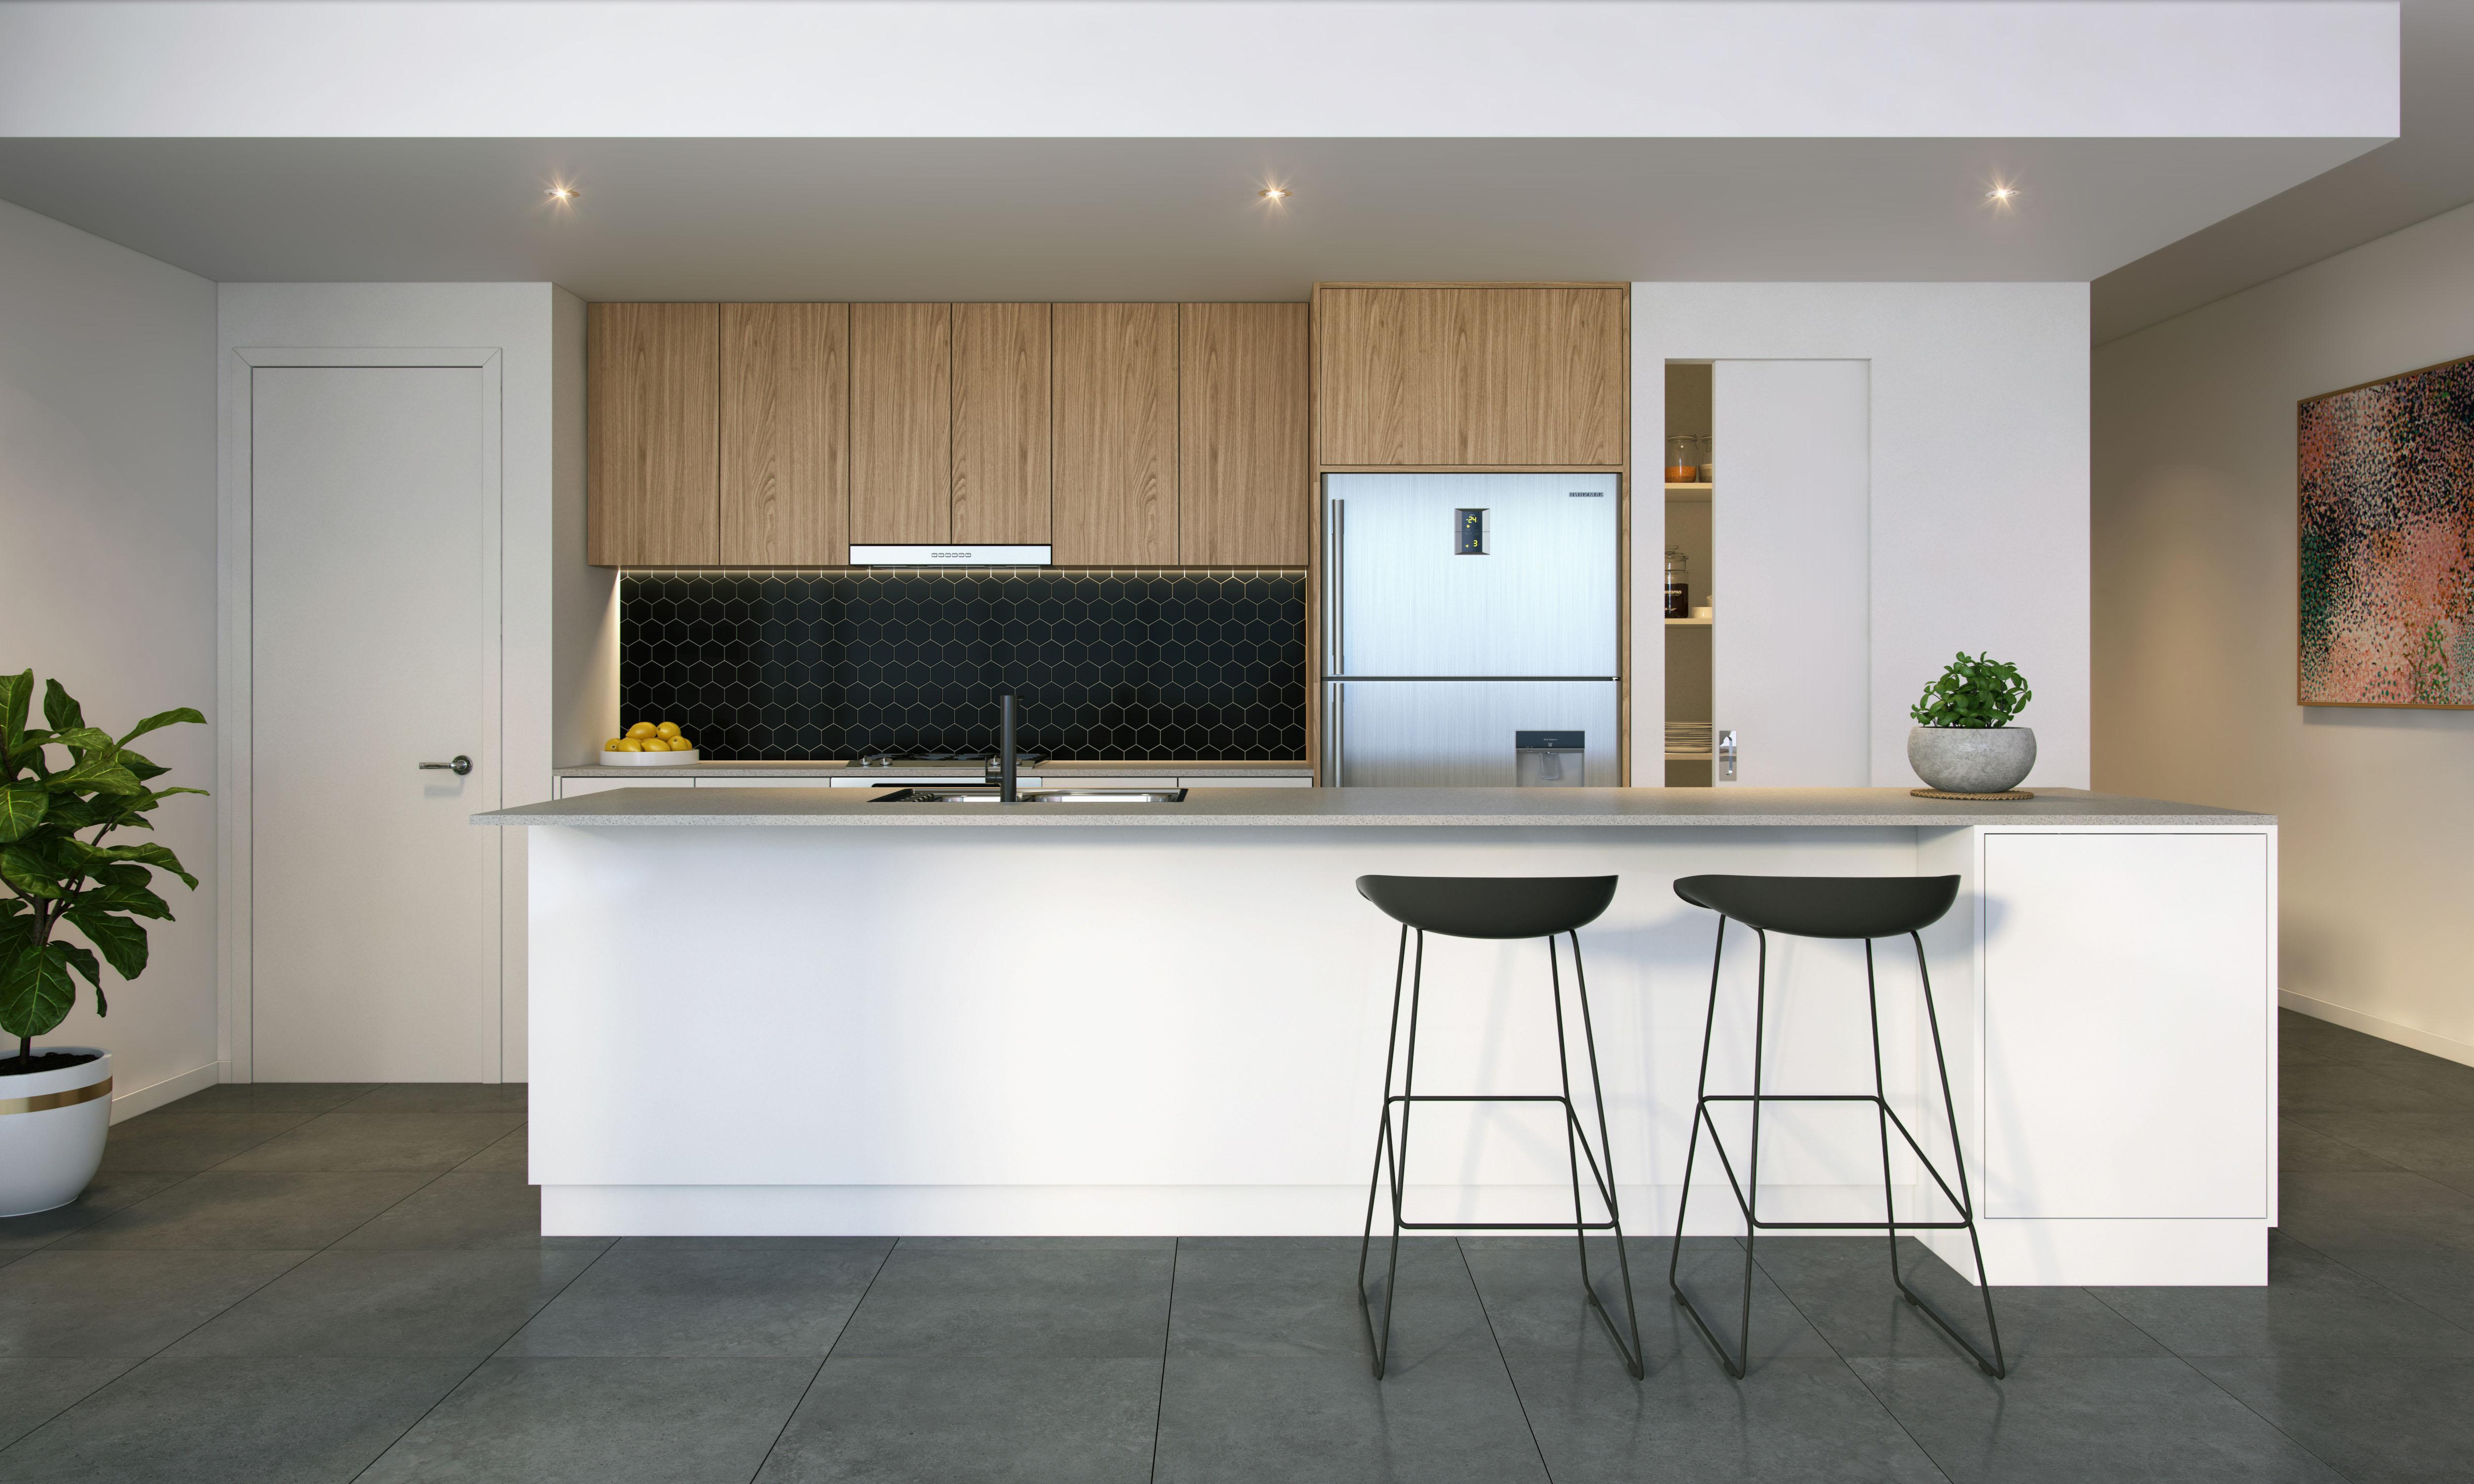 2019.10.09 Newcastle_Kitchen VARGA-Standard 01- low res